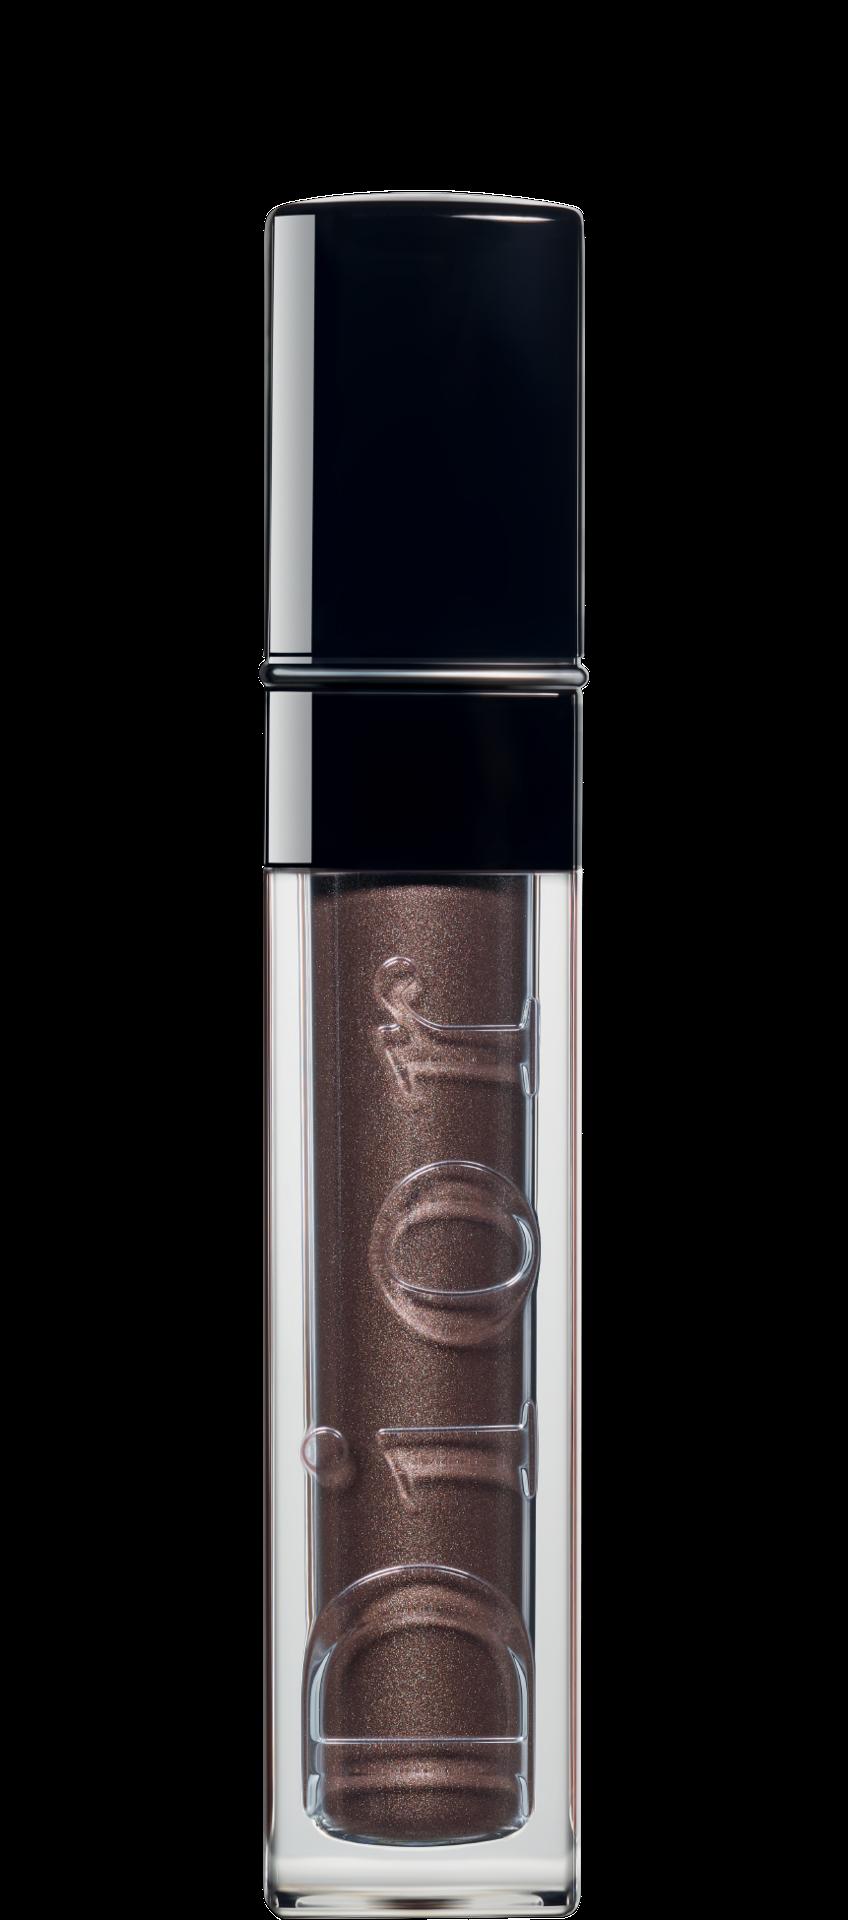 1aaf6e74aa Diorshow Liquid Mono - Limited Edition 480 Graphite - DIOR - KICKS